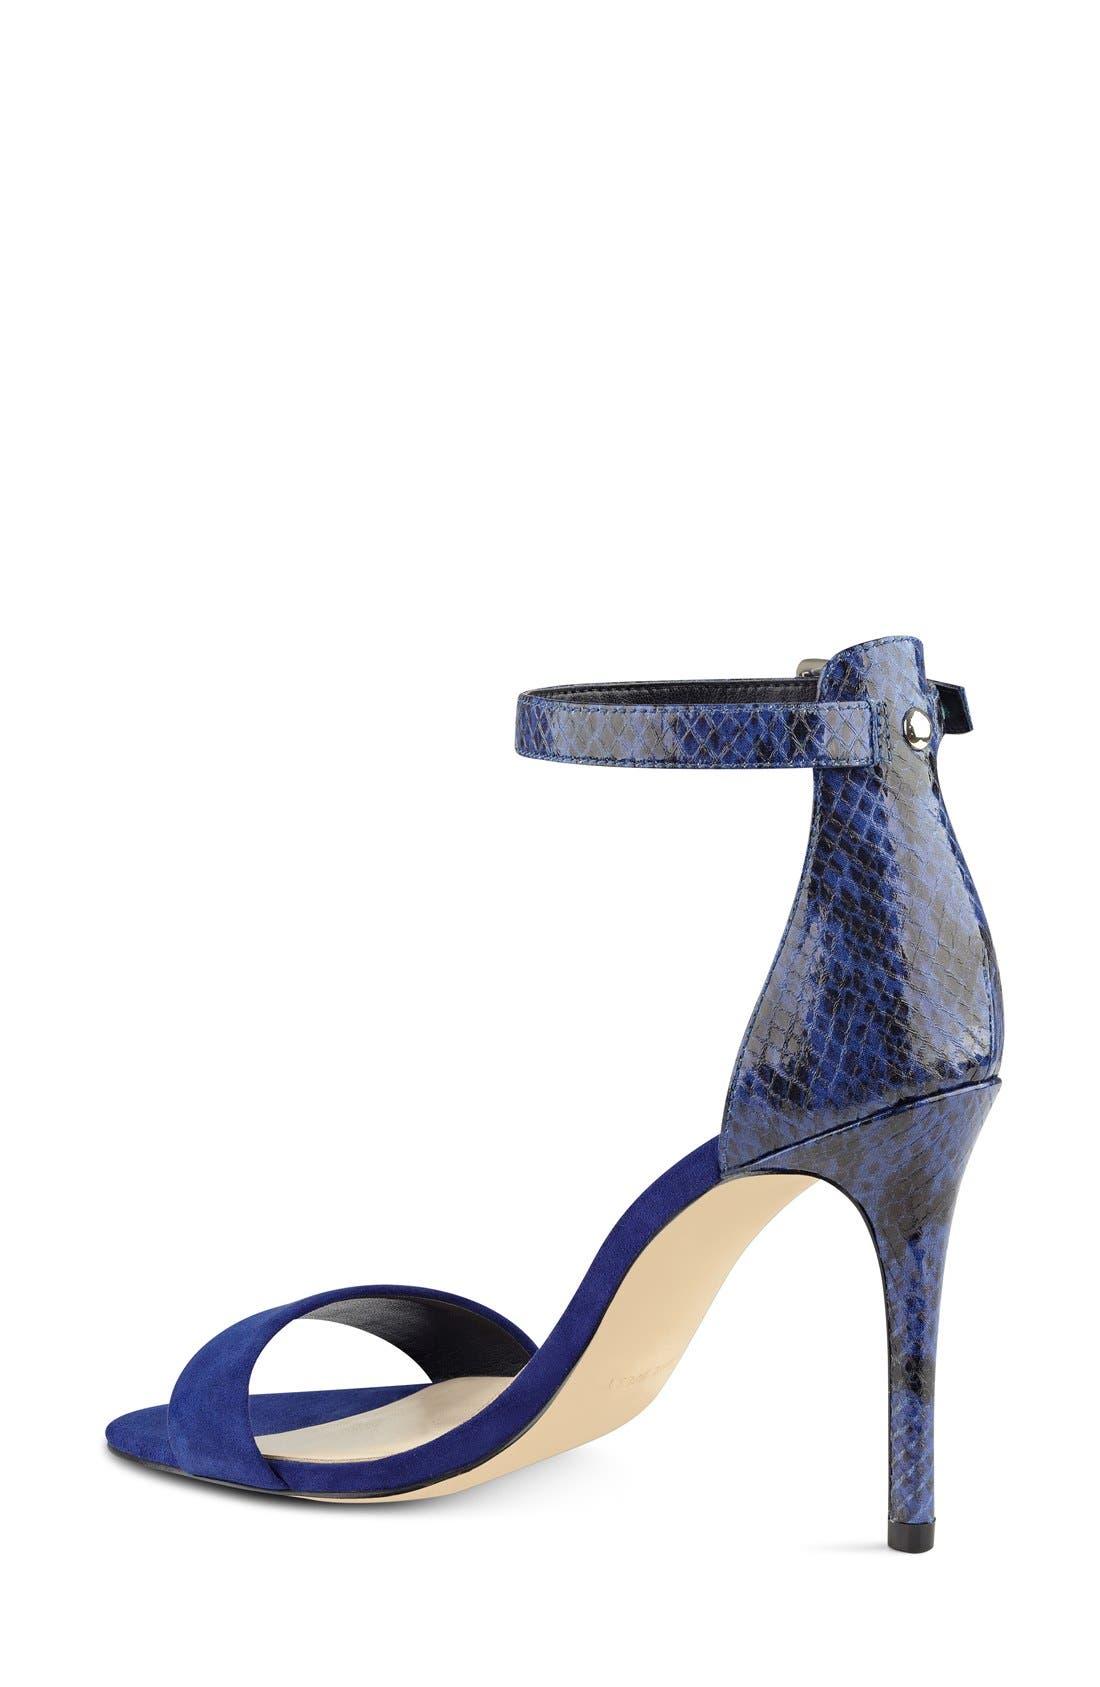 'Mana' Ankle Strap Sandal,                             Alternate thumbnail 10, color,